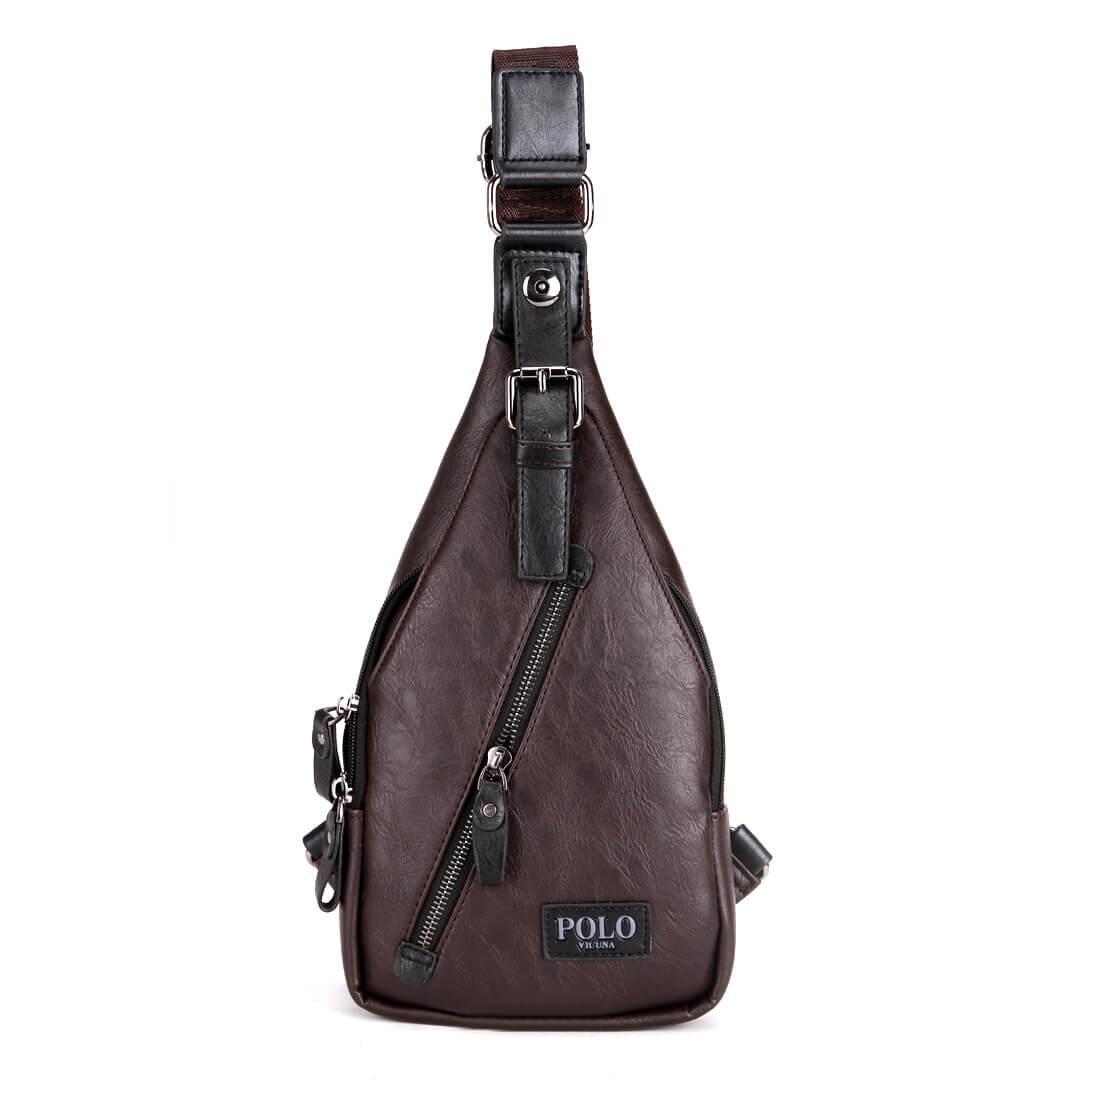 Сумка-мессенджер мужская через плечо Polo Vicuna V9903 коричневая